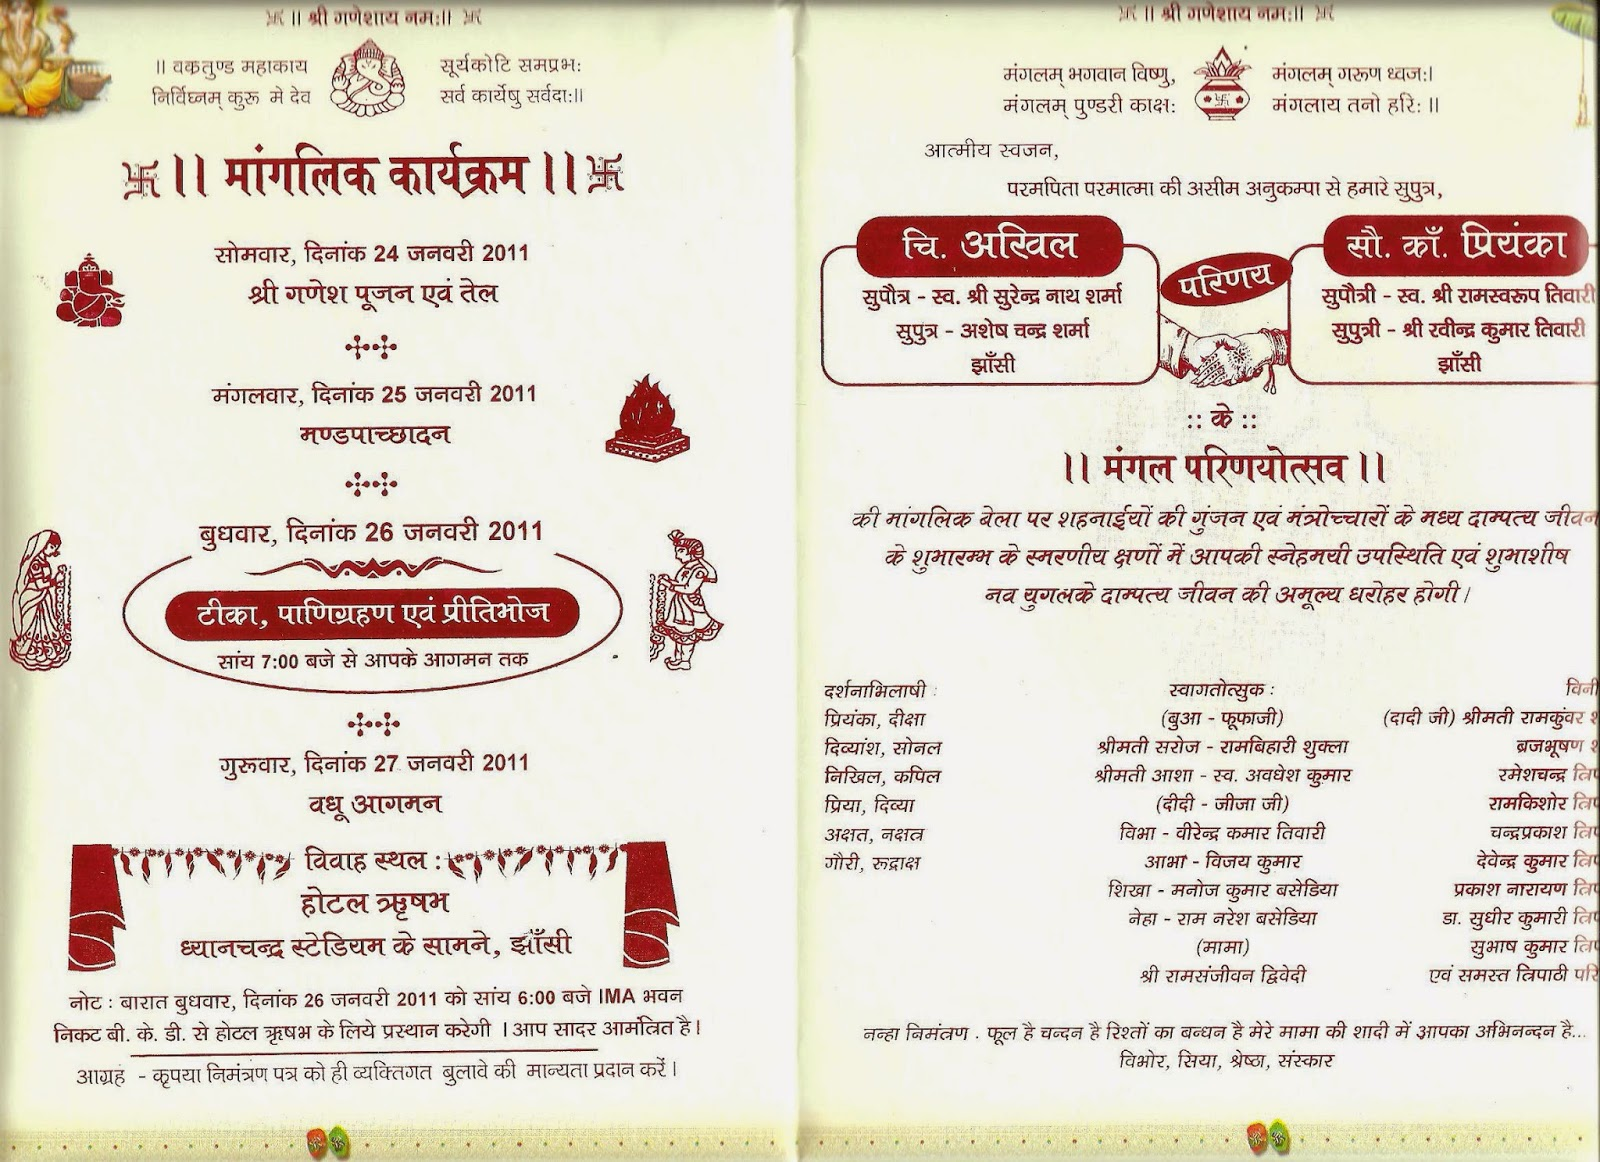 Wedding and Jewellery: Shadi patrika matter in hindi